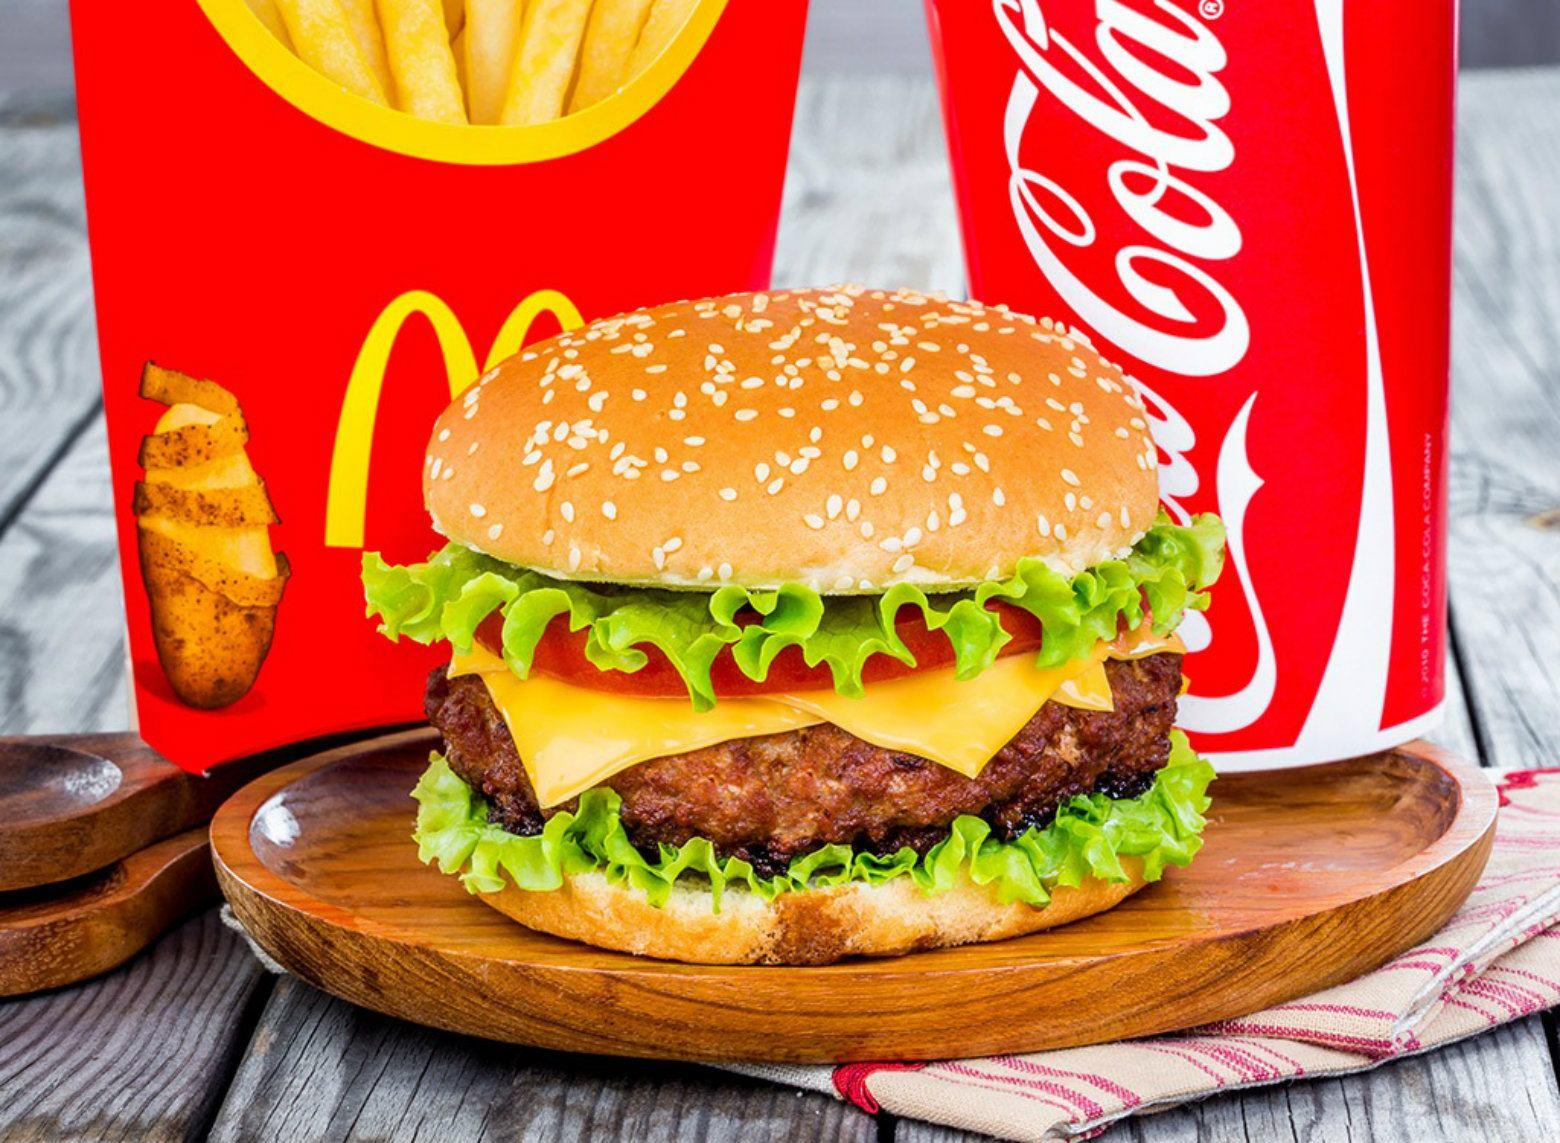 slamme eating fast food - HD1560×1143